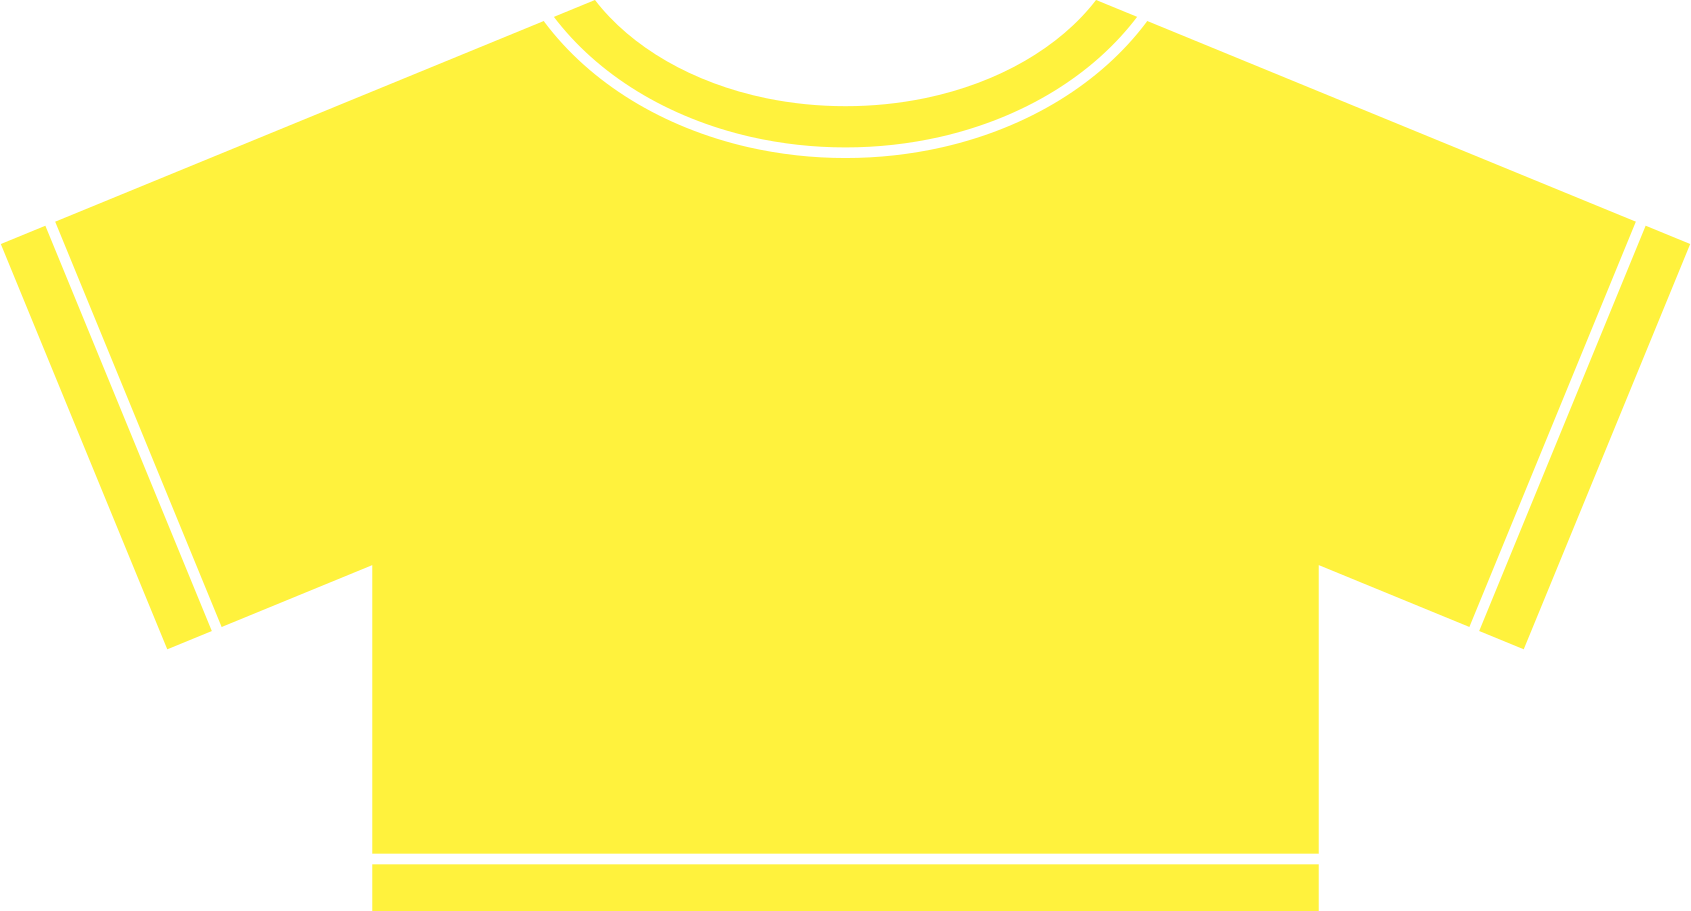 t shirt Clipart illustration in PNG, SVG